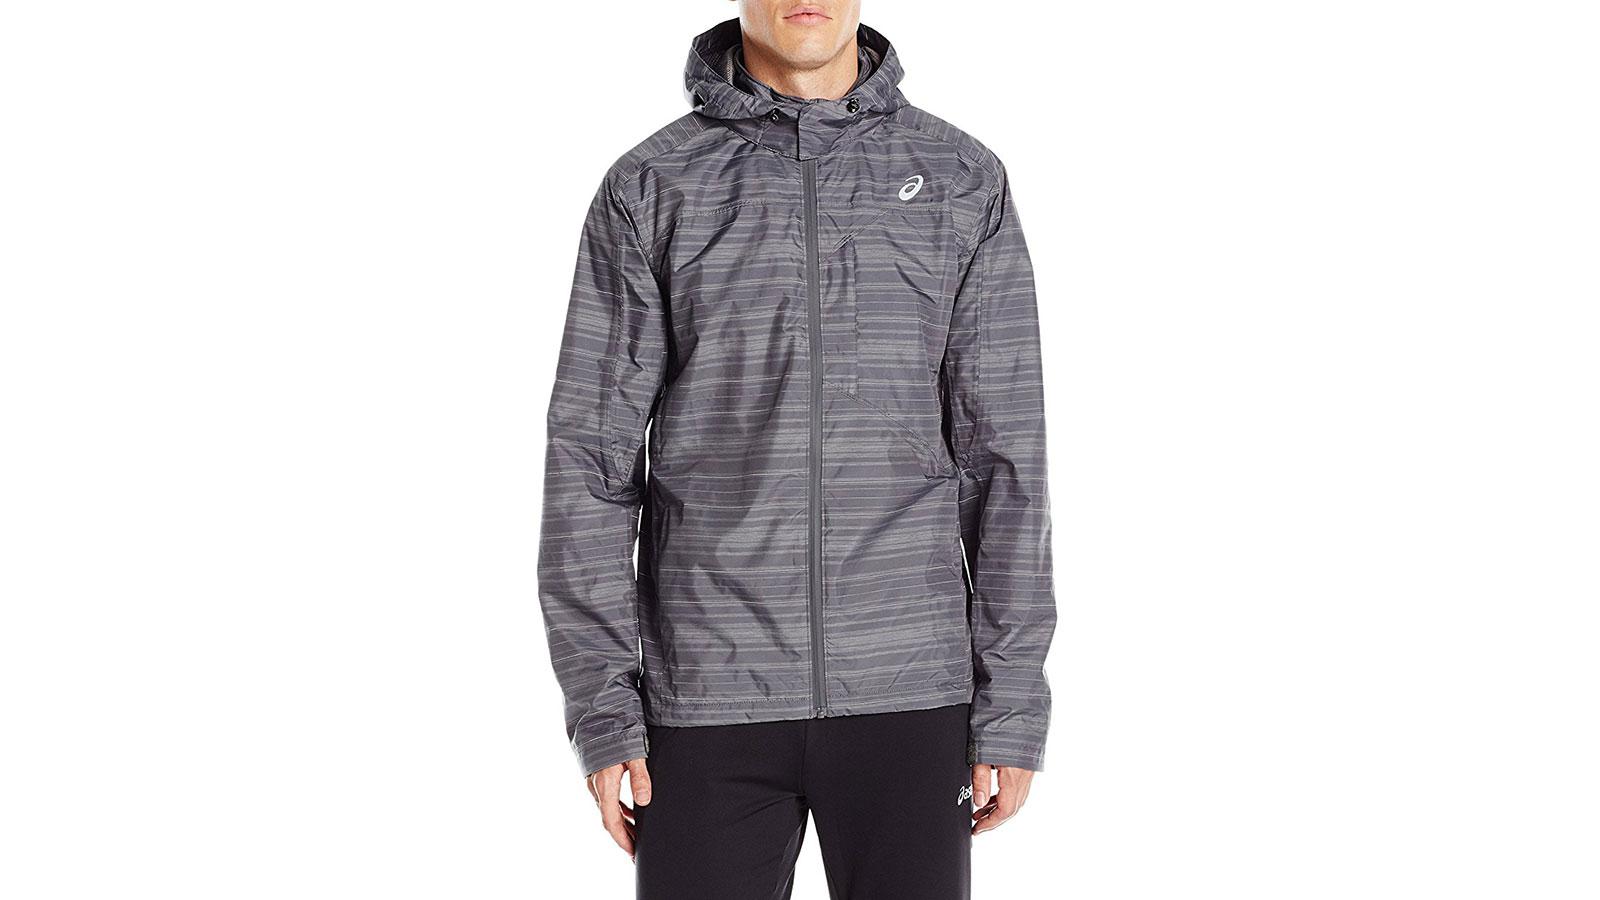 Asics Storm Shelter Running Men's Windbreaker Jacket | the best men's windbreakr jackets